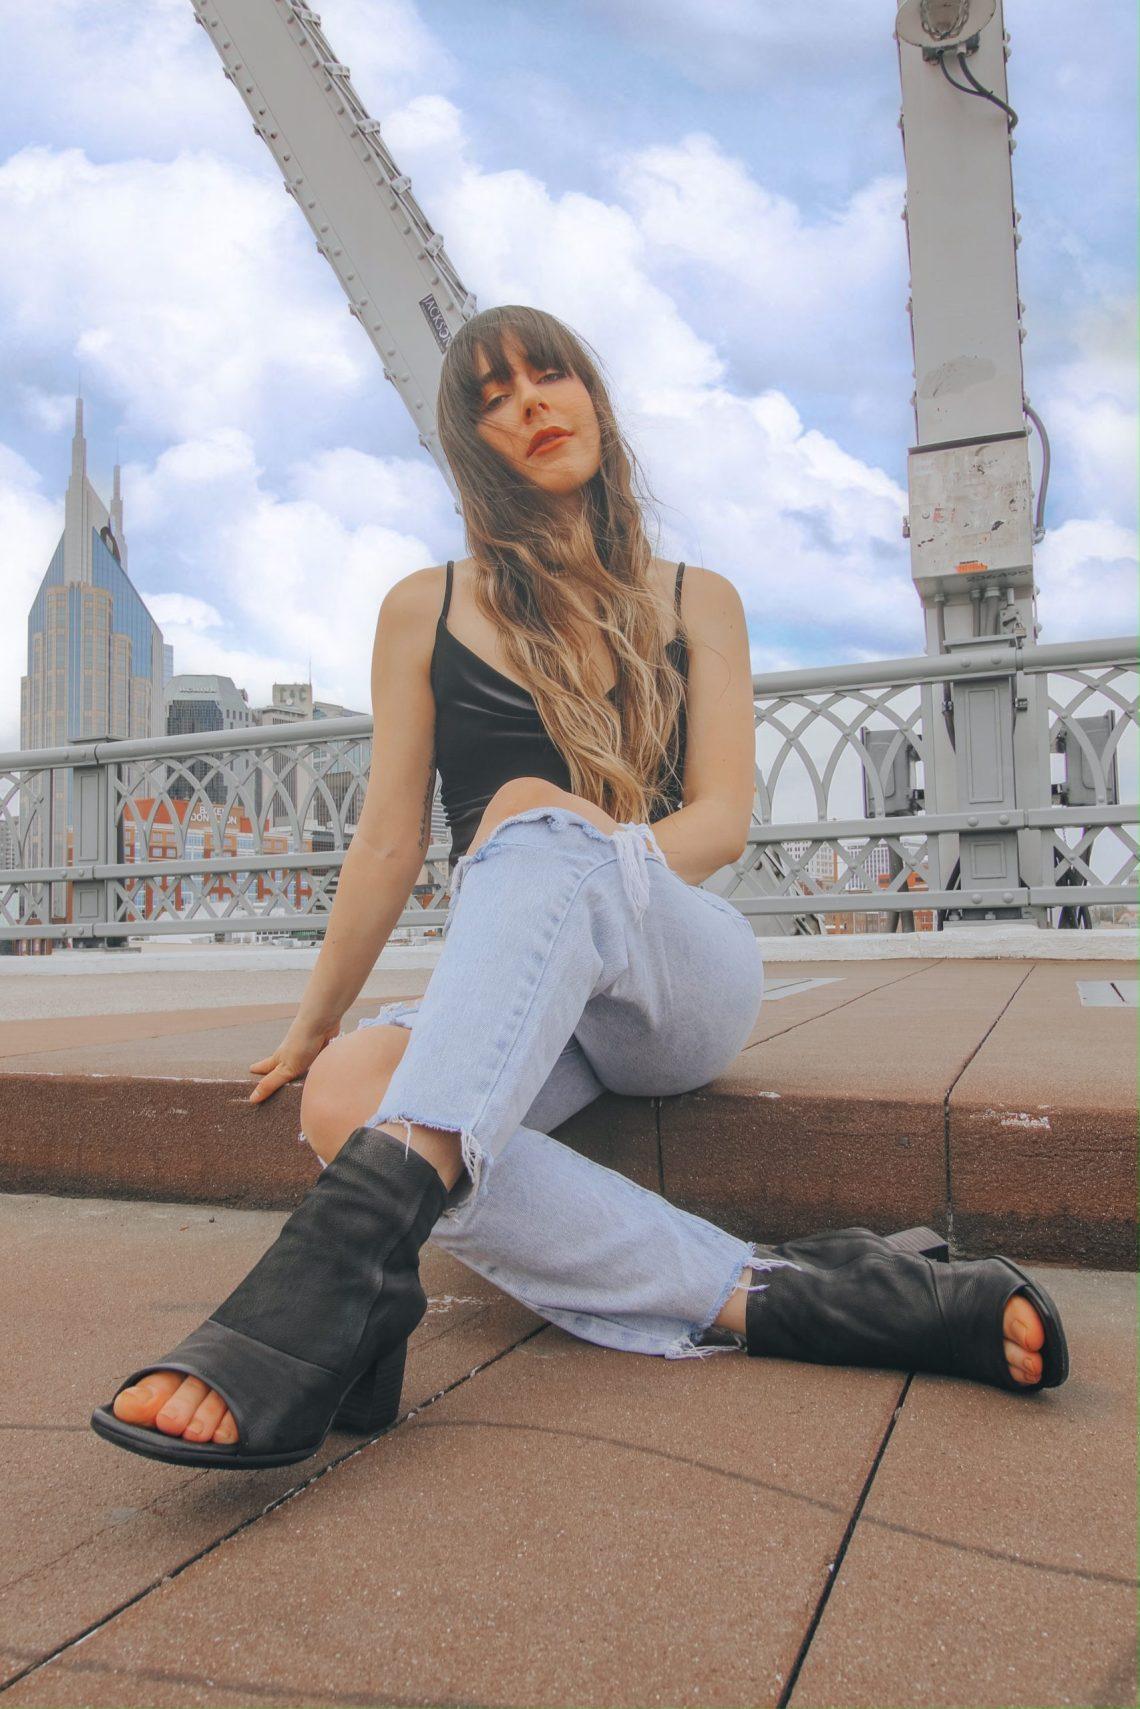 John Siegenthaler Pedestrian Bridge, city bridge, city views, cityscape, fashion, Nashville, TN, Instagram, photography, the best Instagram spots in Nashville, Nashville travel guide, travel, The Urban Darling, travel blogger, fashion blogger.